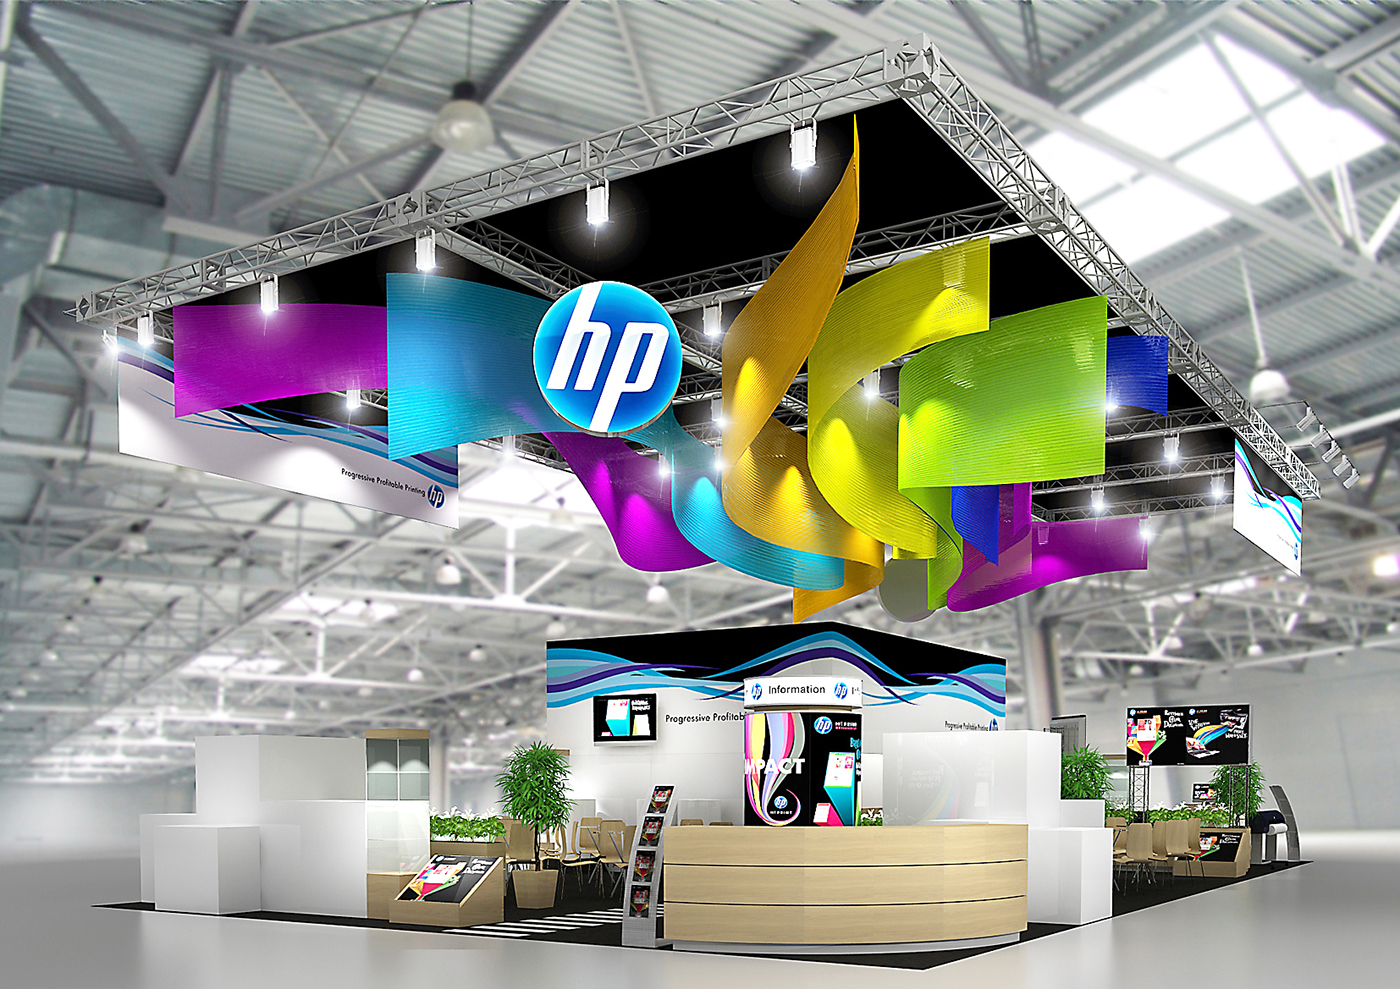 Exhibition Stand Design Behance : Exhibition stand hp on behance